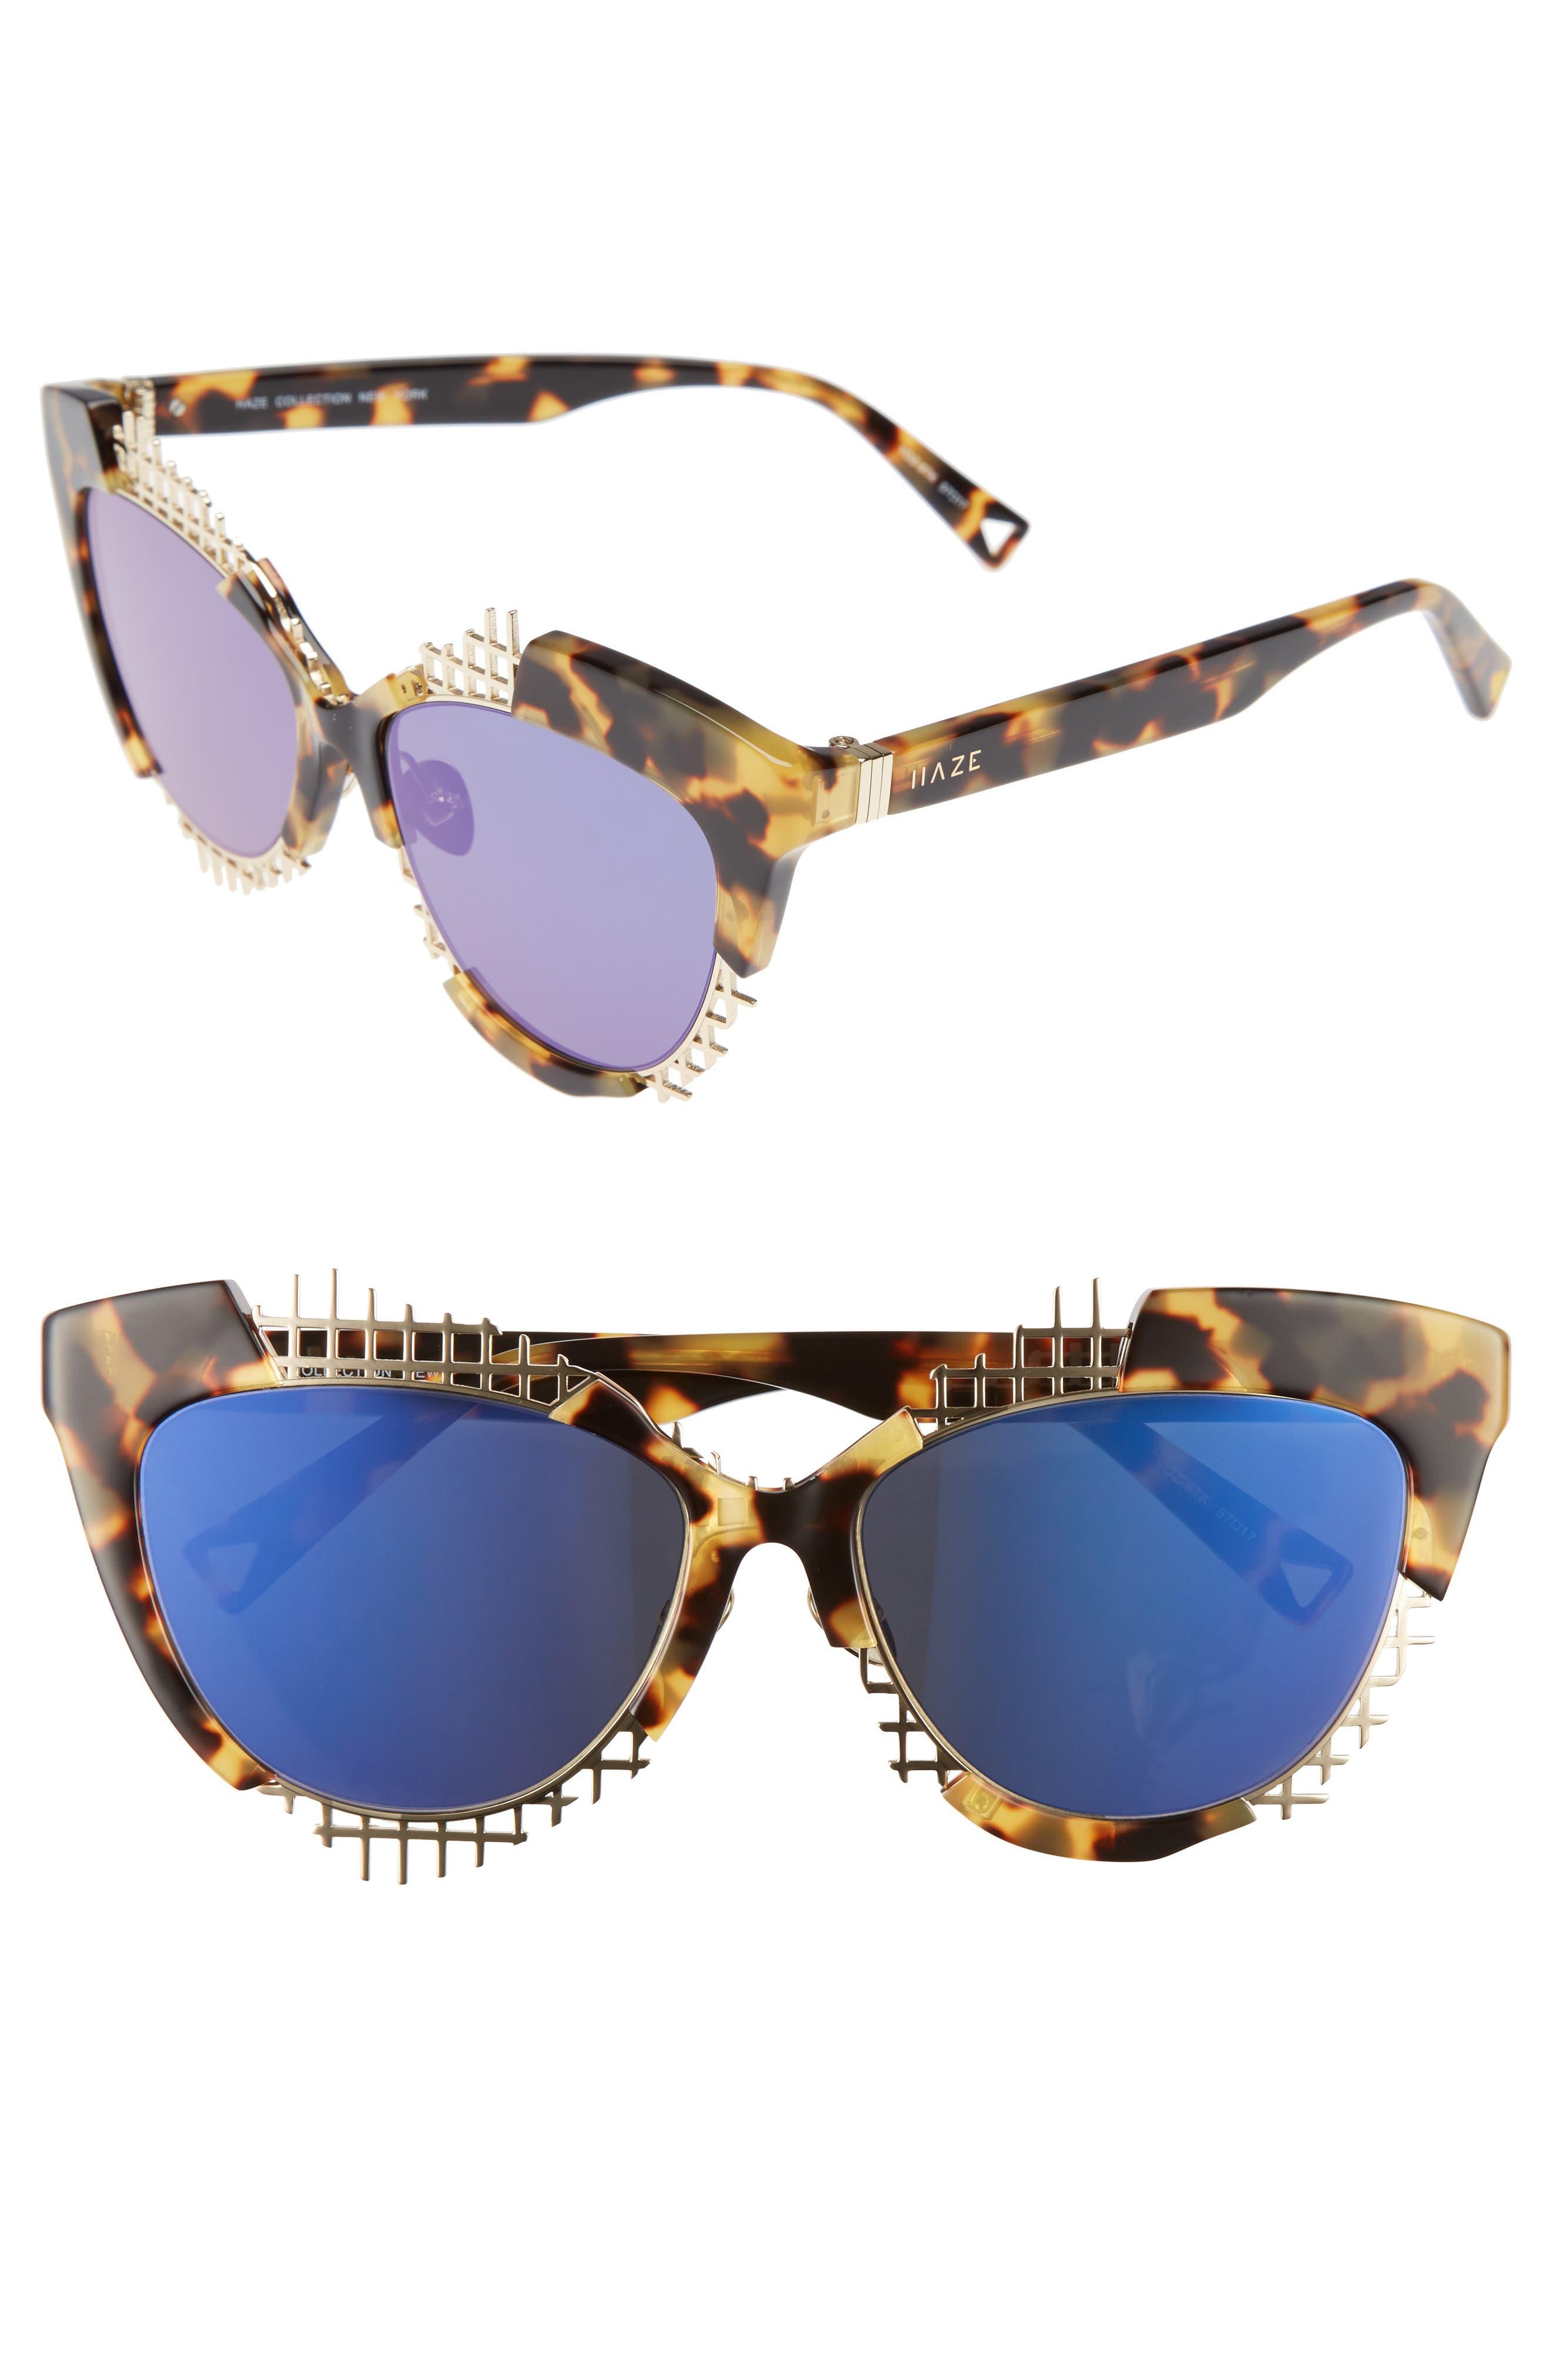 HAZE Voz 55mm Cat Eye Sunglasses